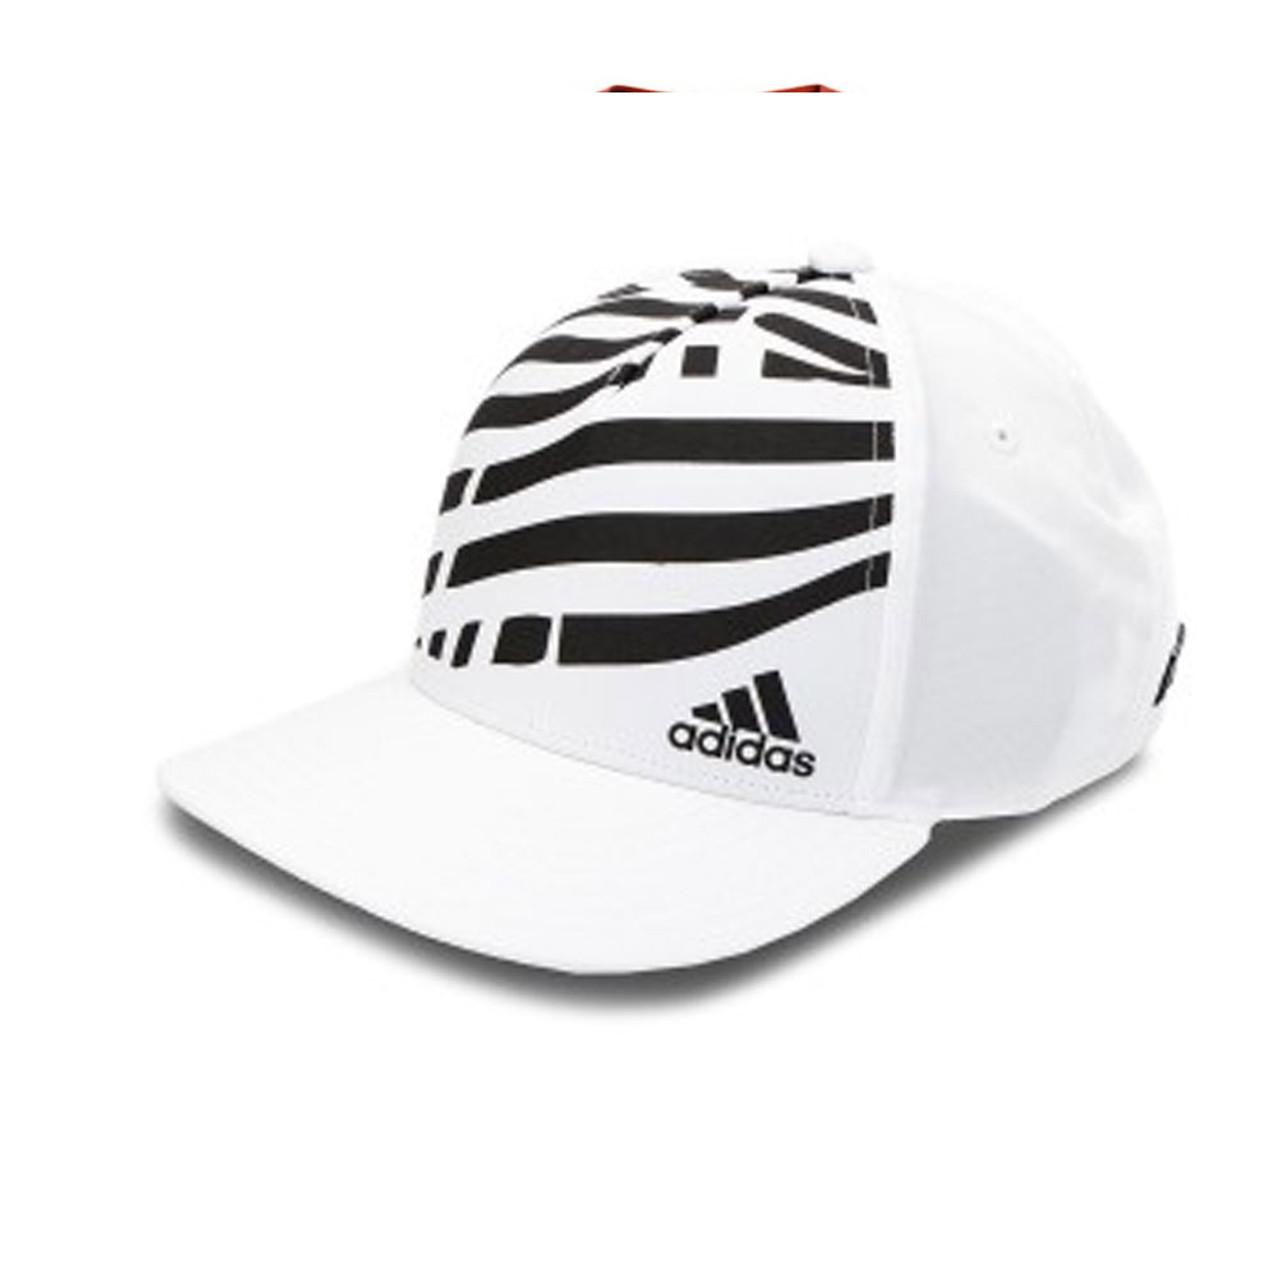 a2406b34730a5 ADIDAS juventus S16 2018 19 cap  white black